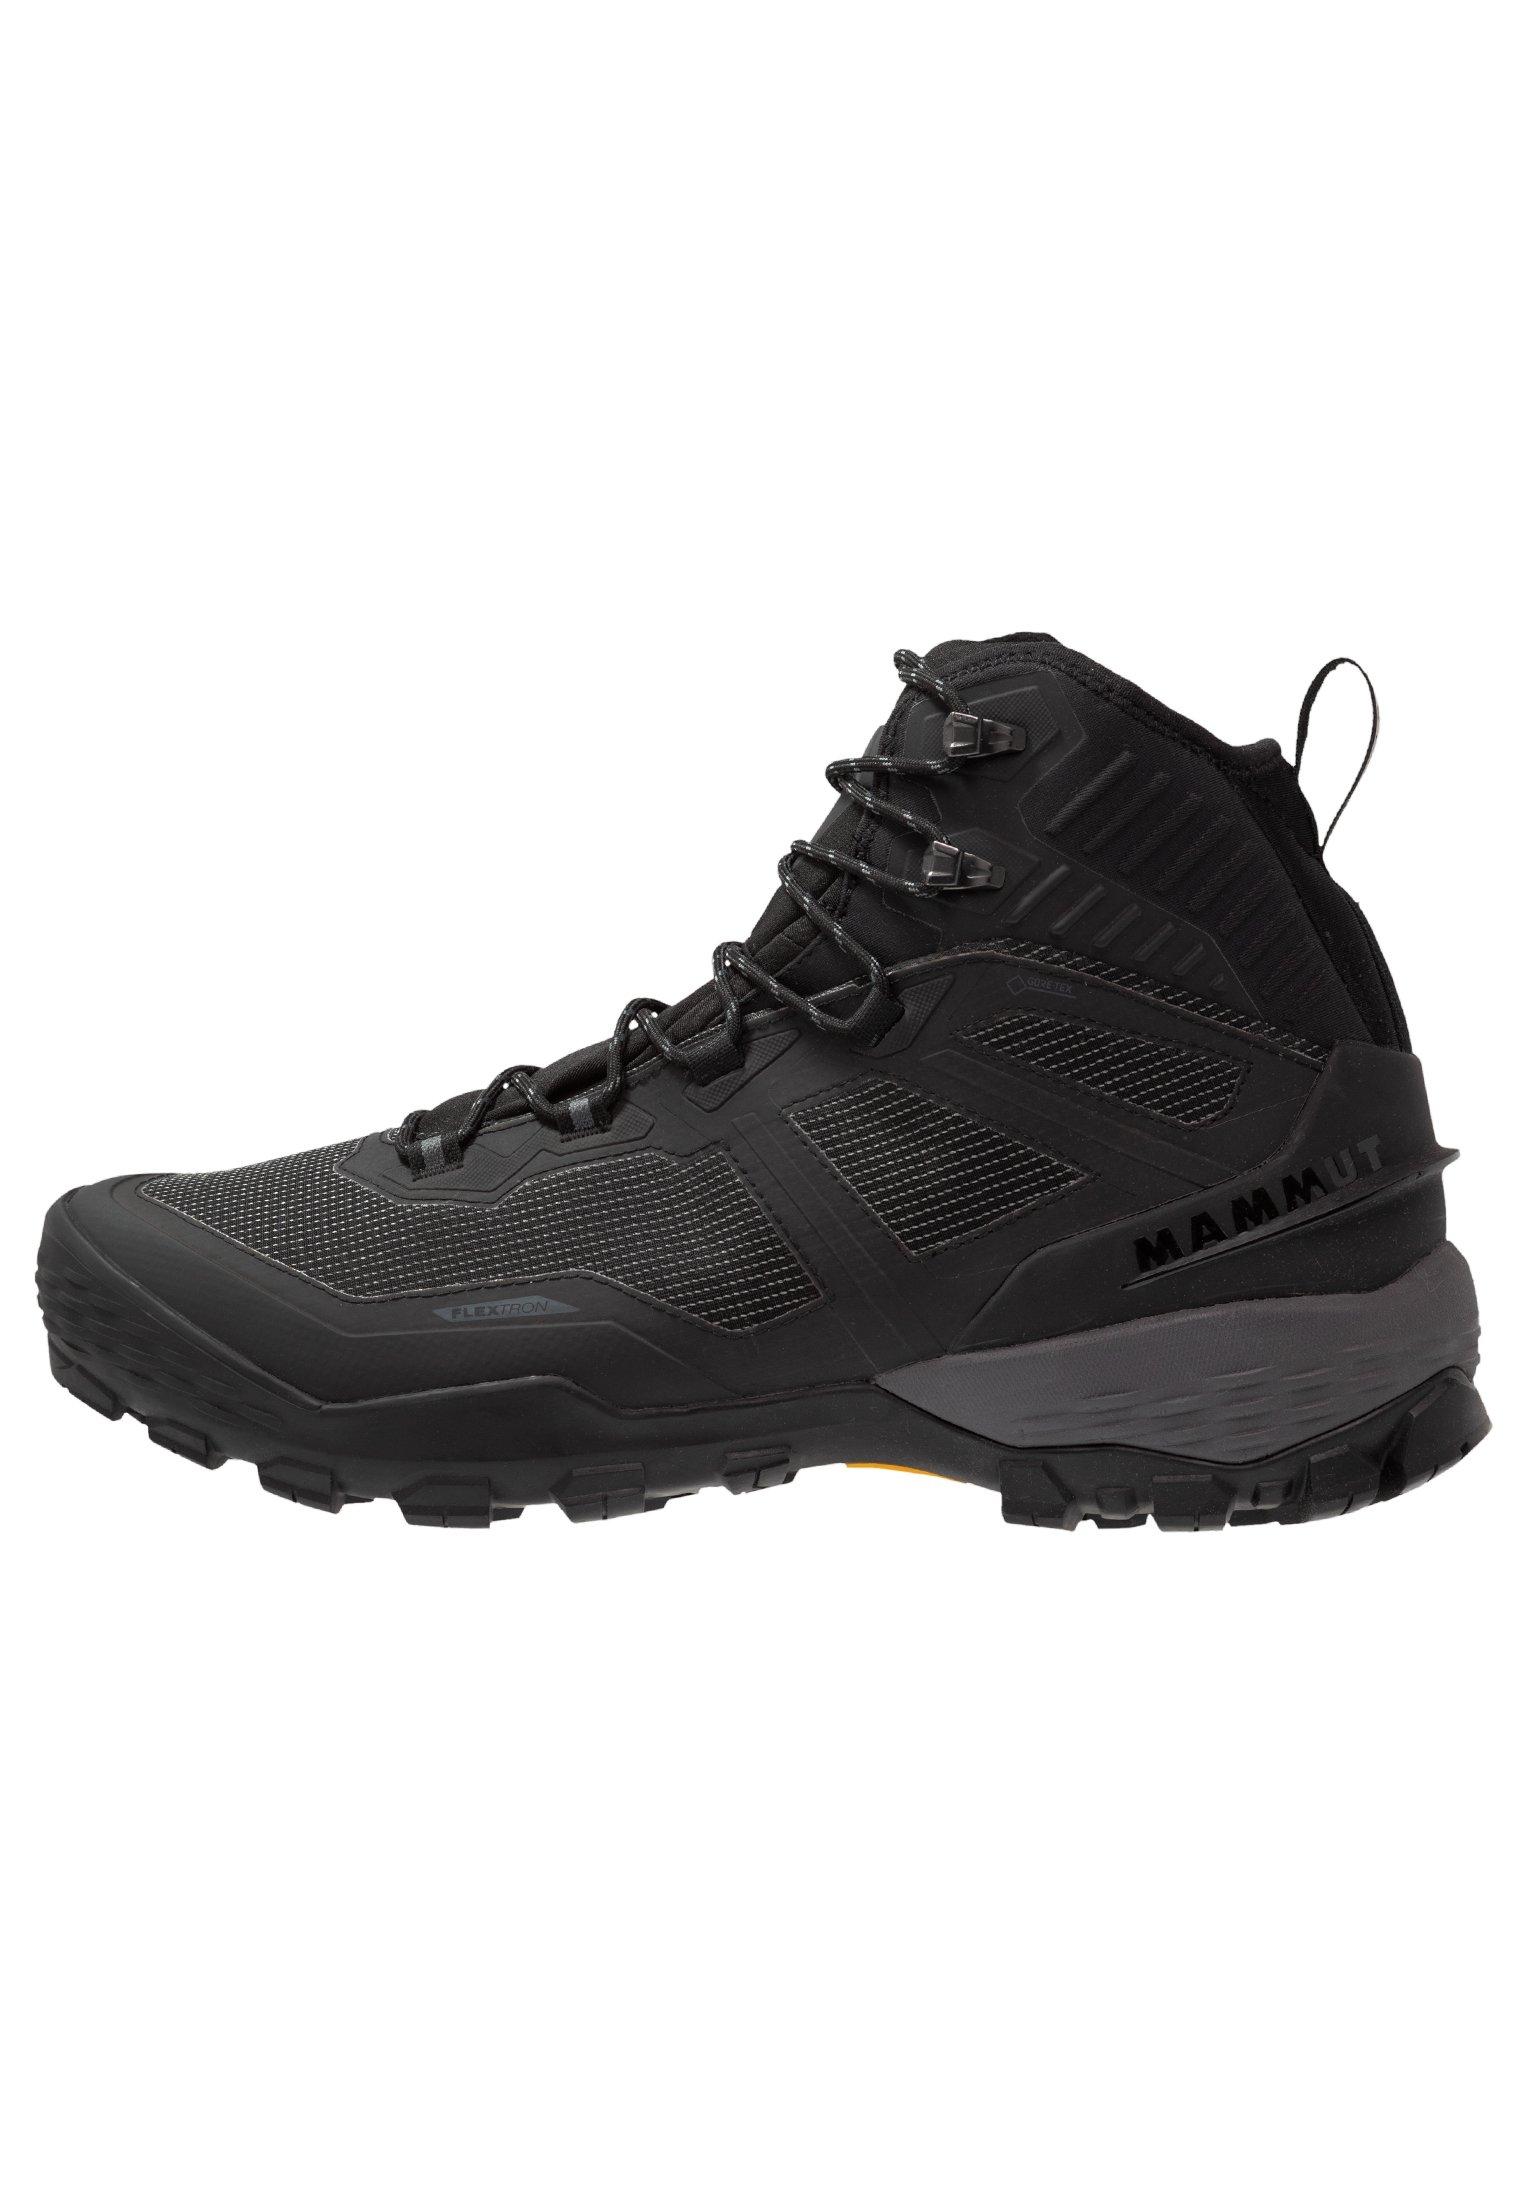 Men DUCAN PRO HIGH GTX MEN - Winter boots